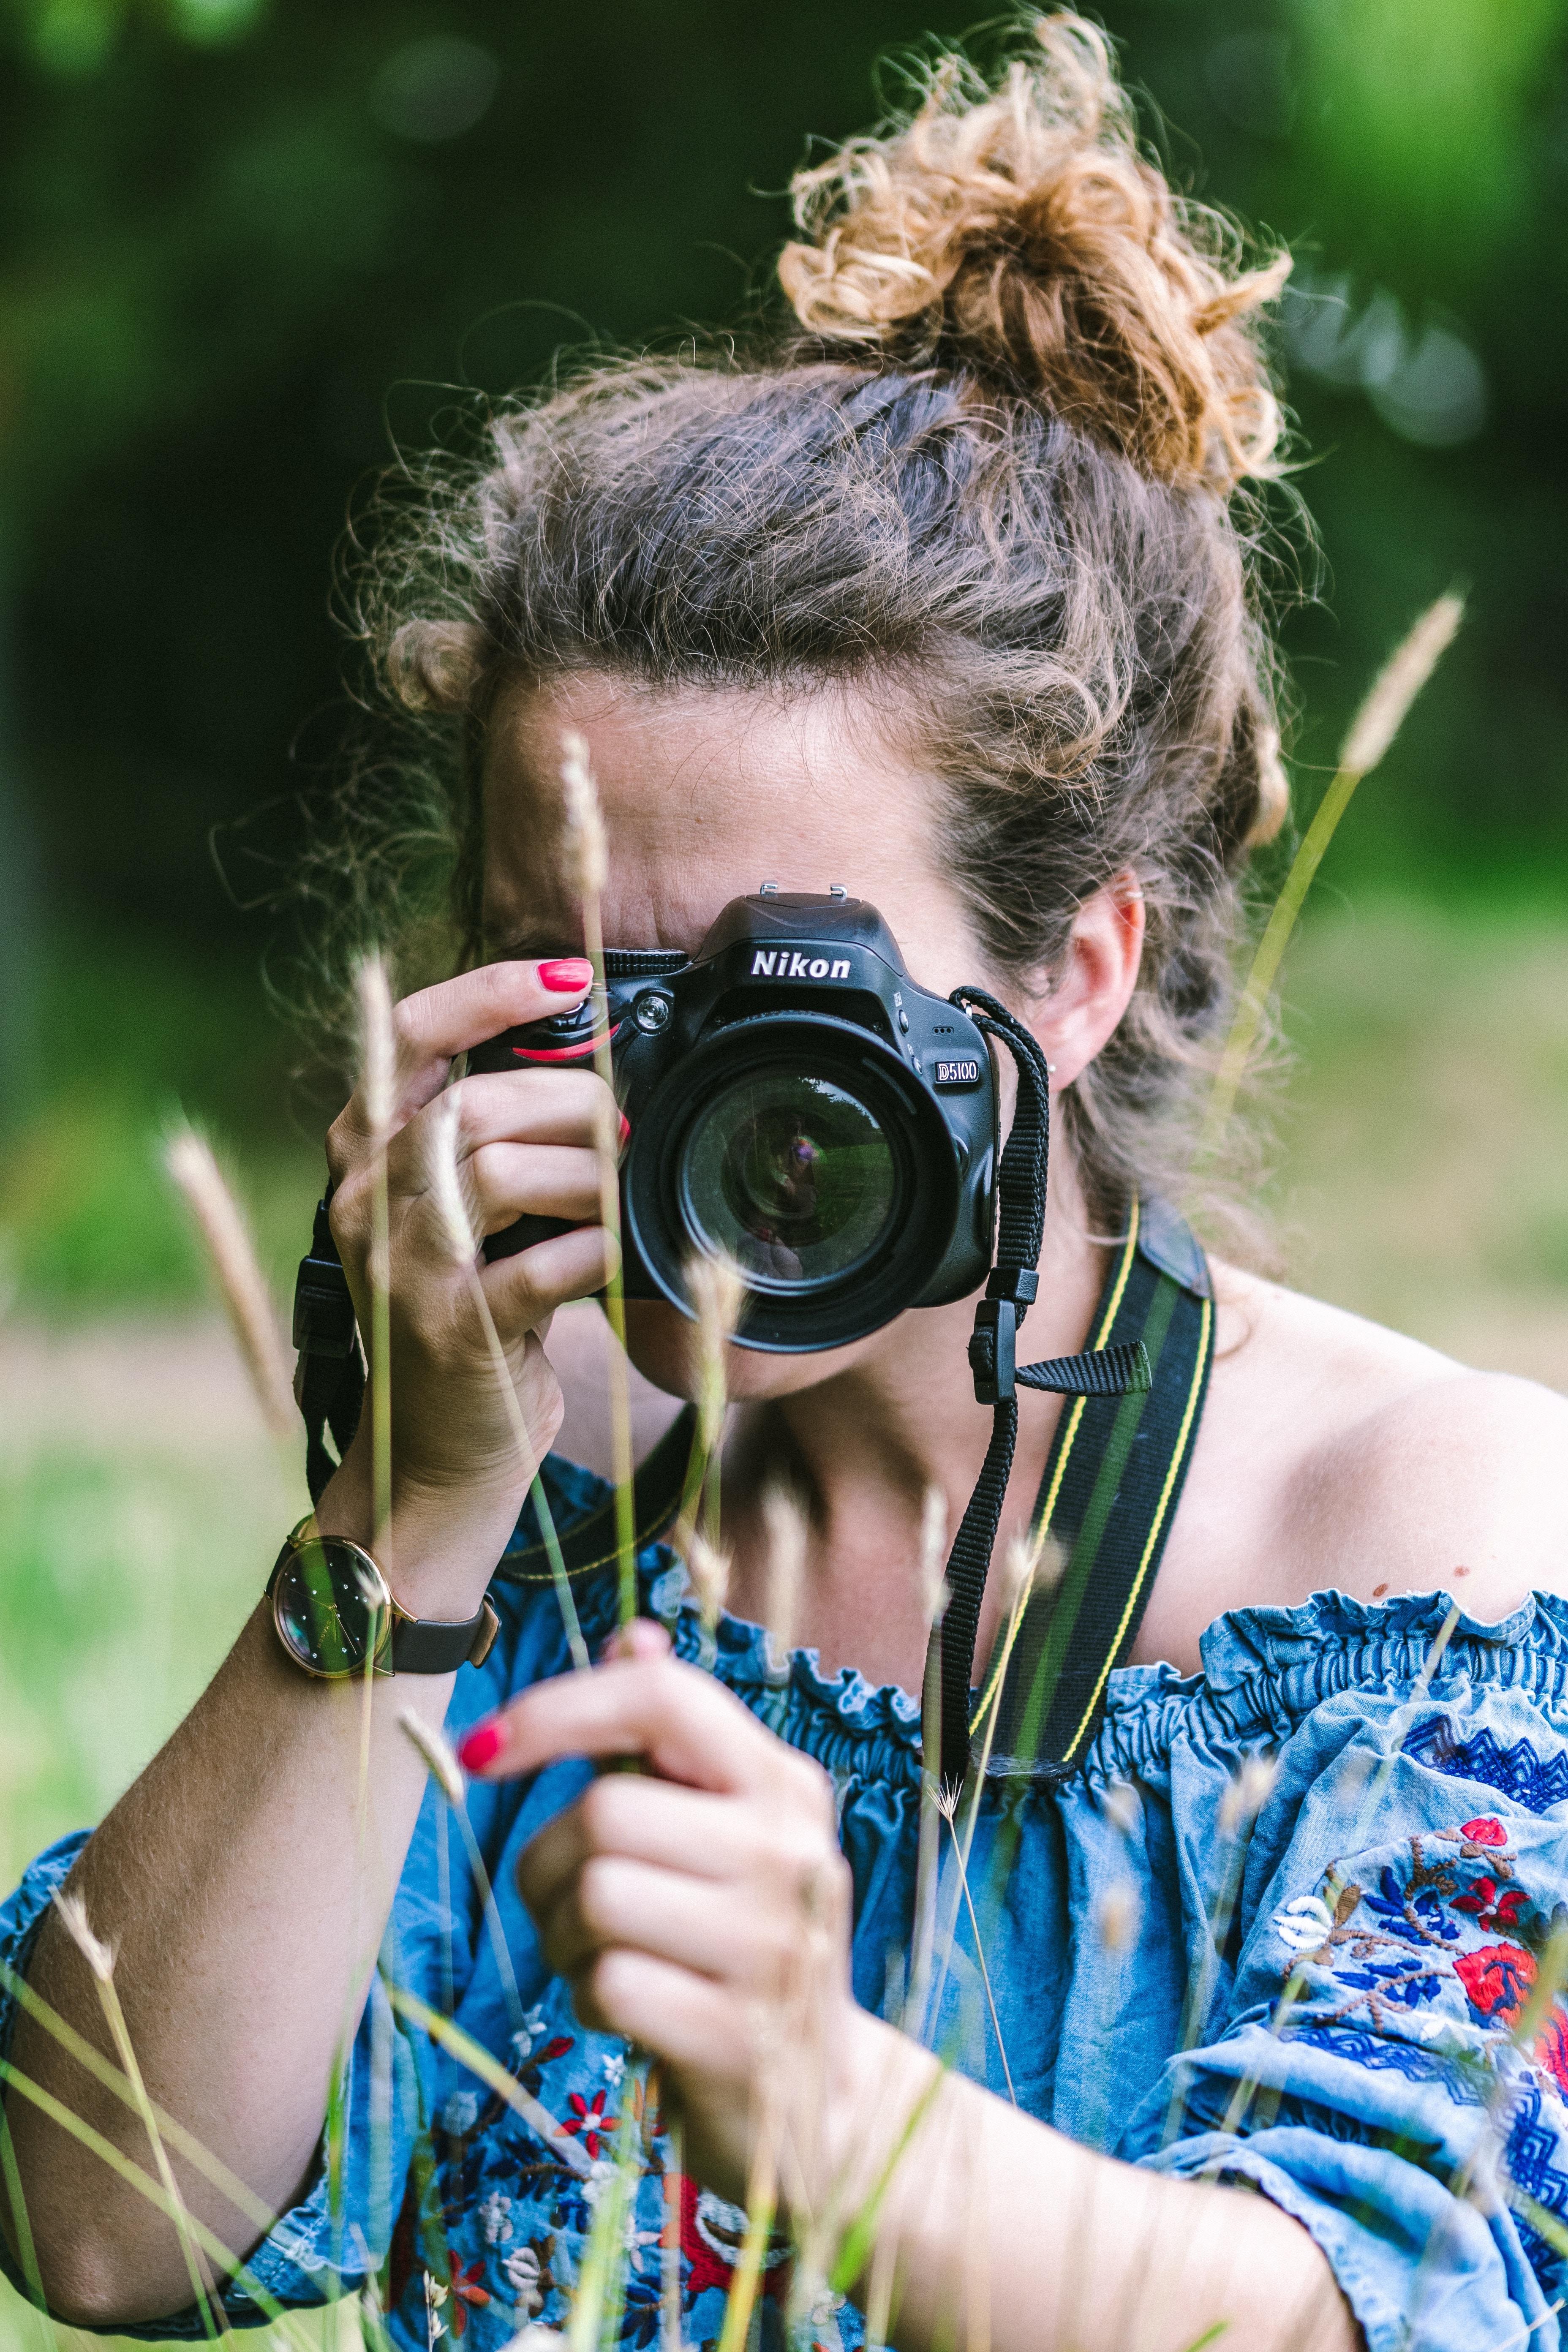 woman wearing blue dress holding camera during daytime